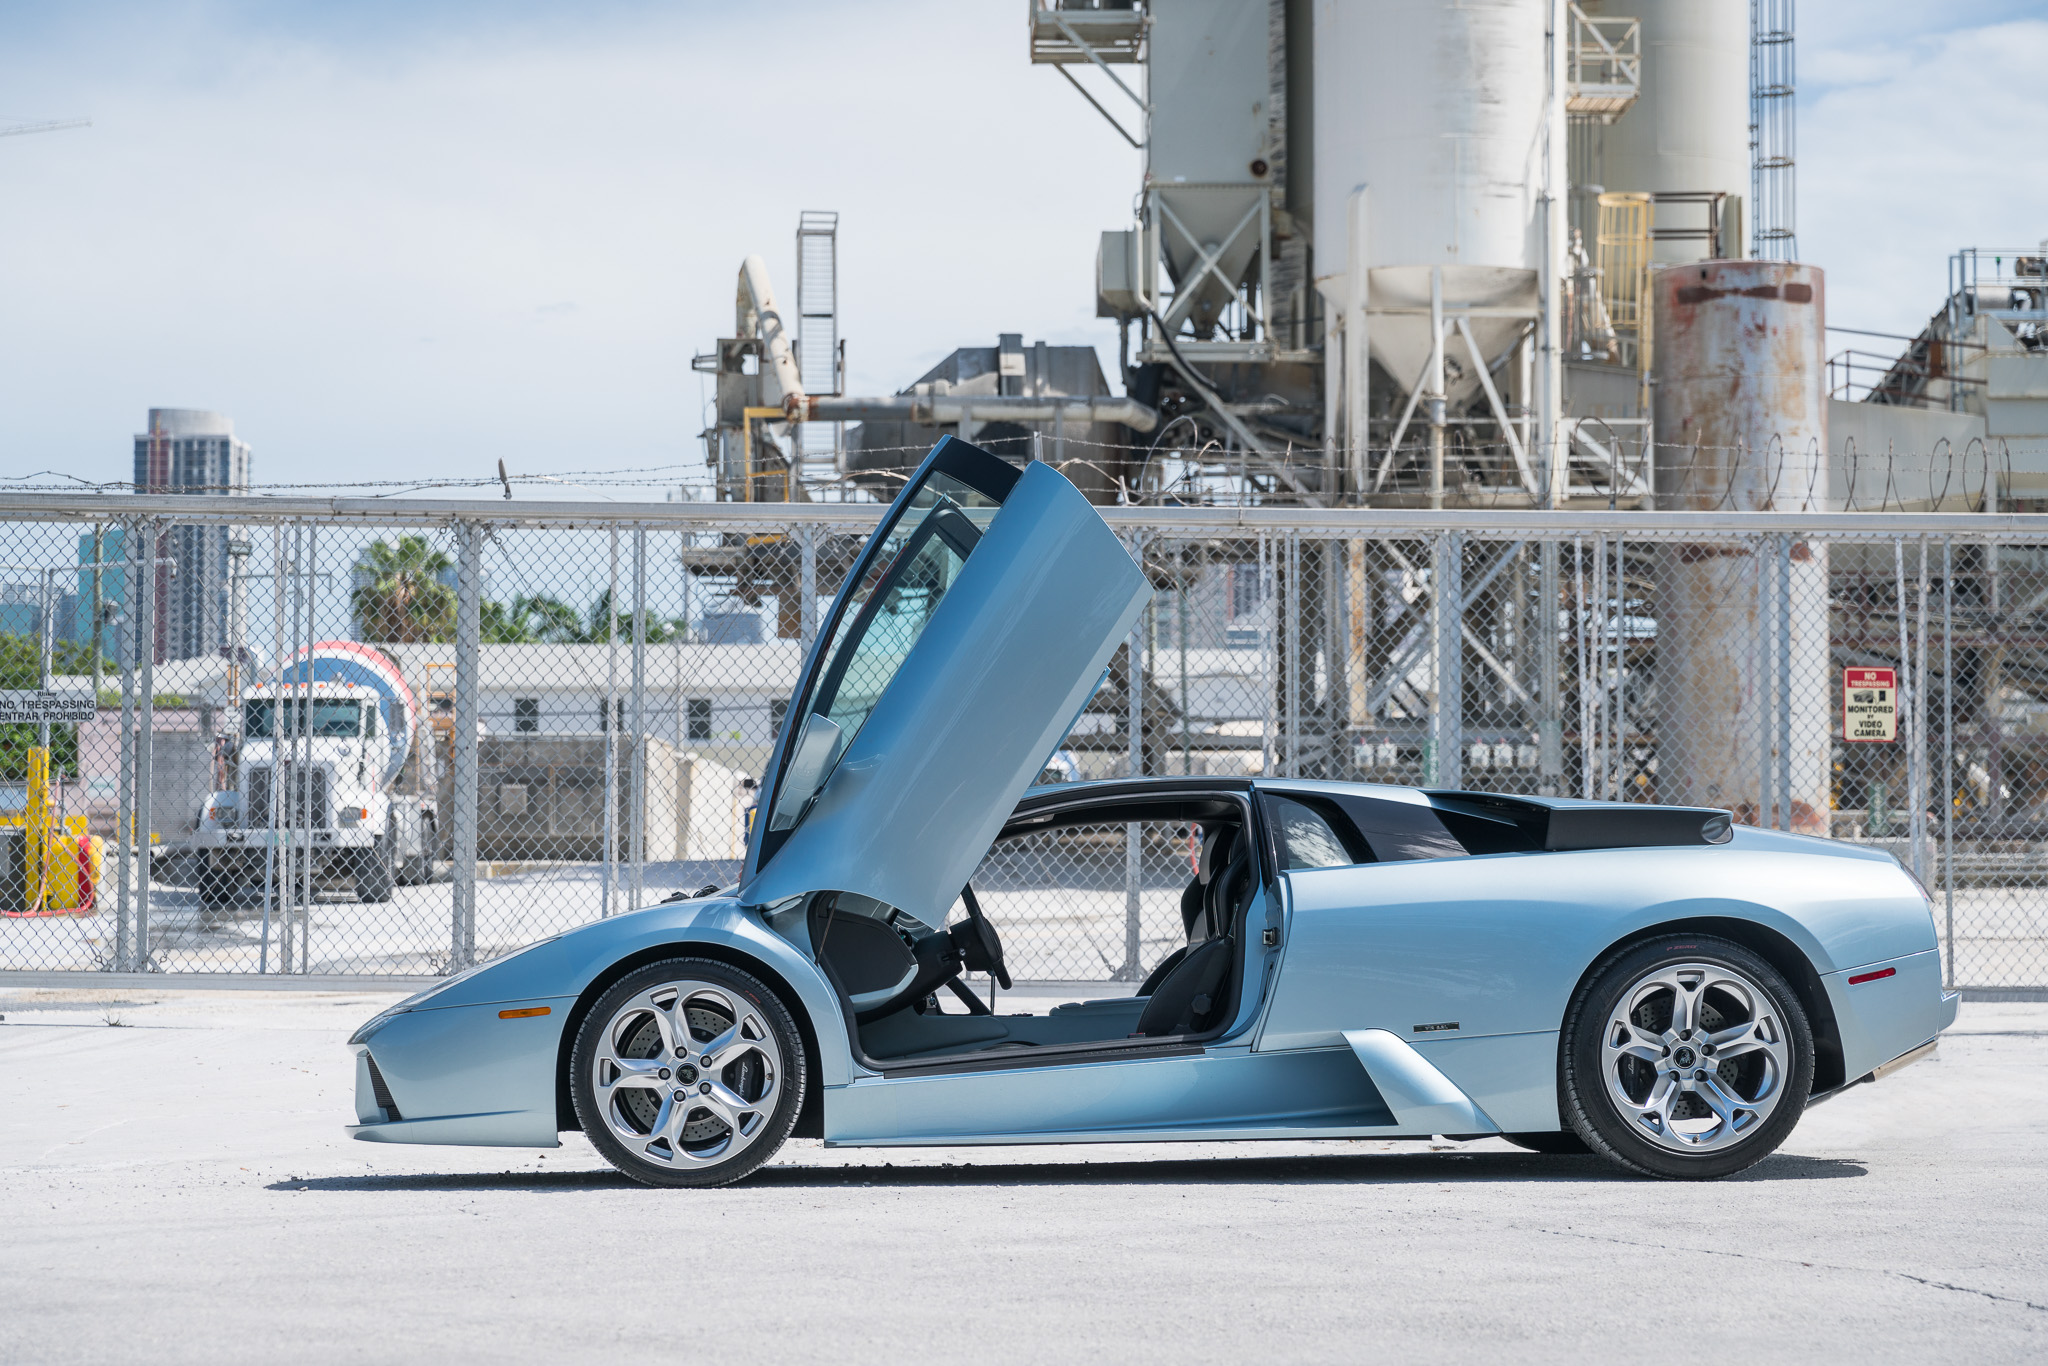 Lamborghini Murcielago 6spd Light Blue Metallic 9 Of 25 Curated